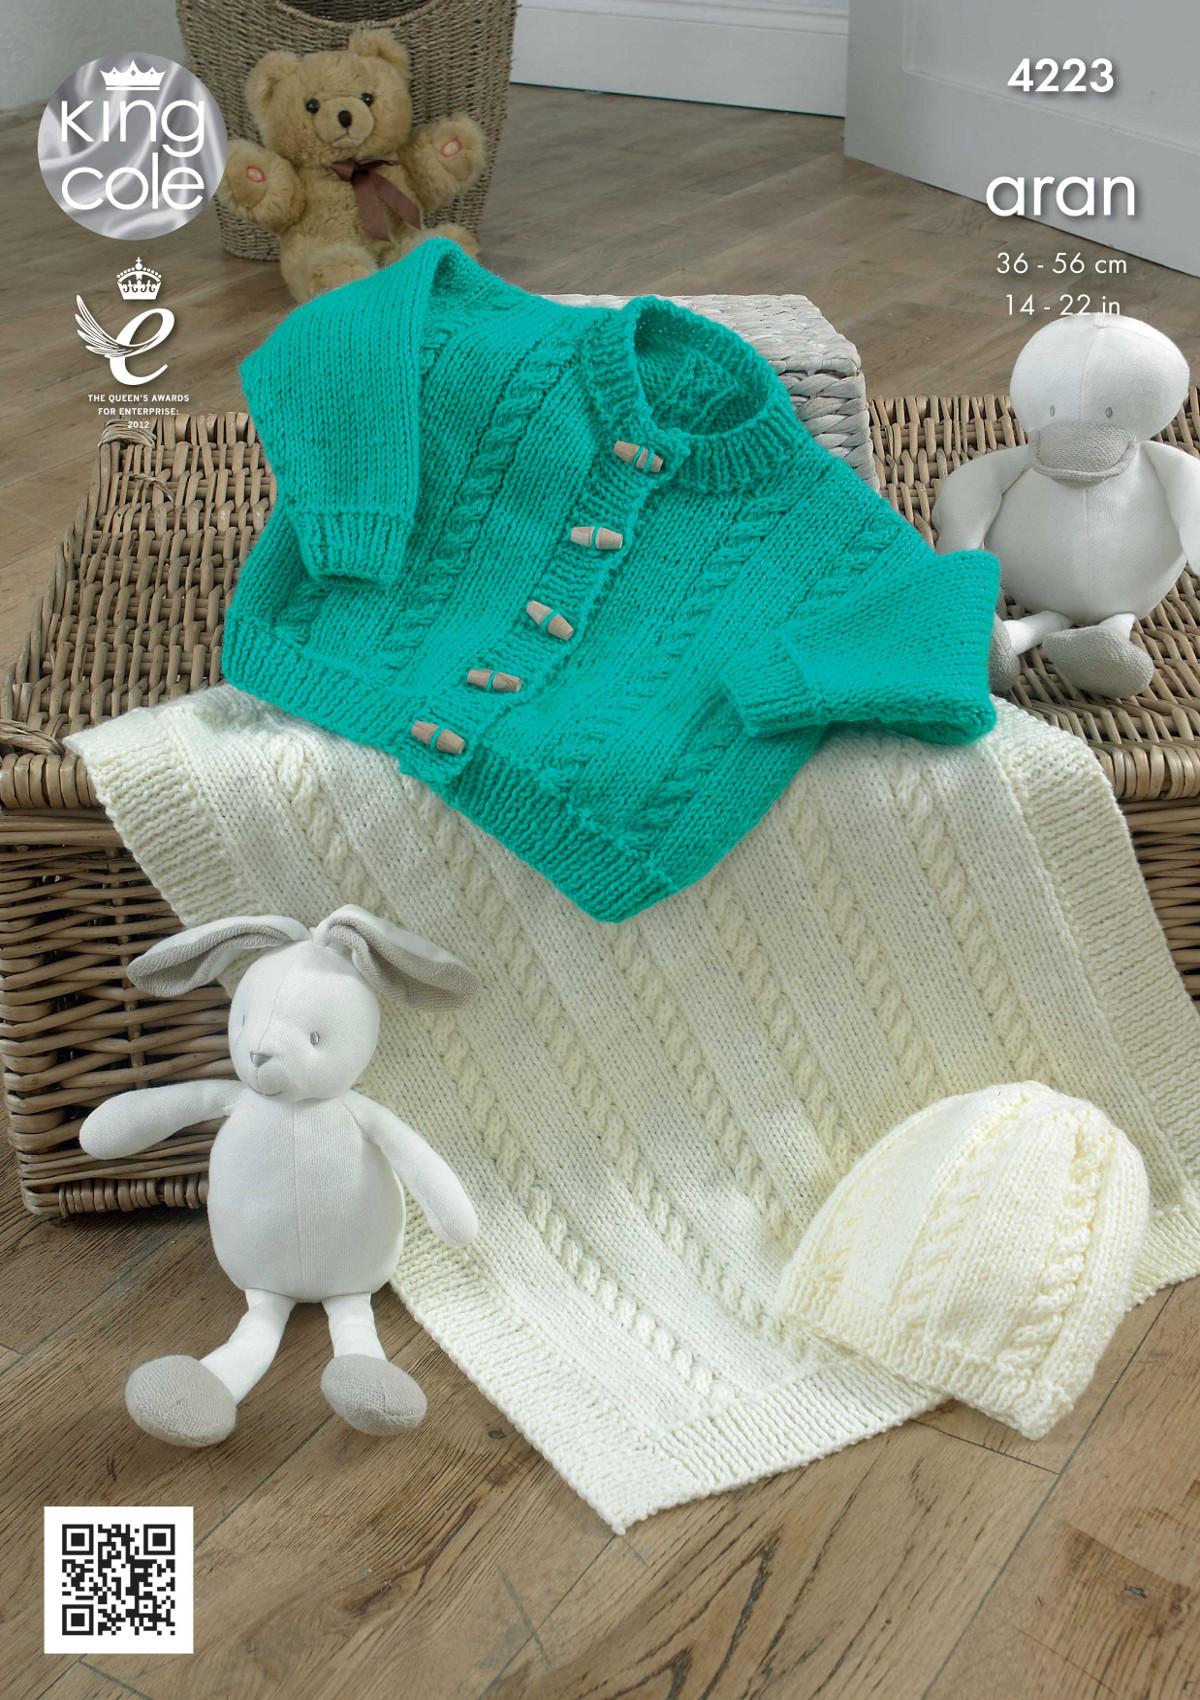 Baby Knitting Pattern King Cole Blanket, Cardigan and Hat Aran 4223 eBay